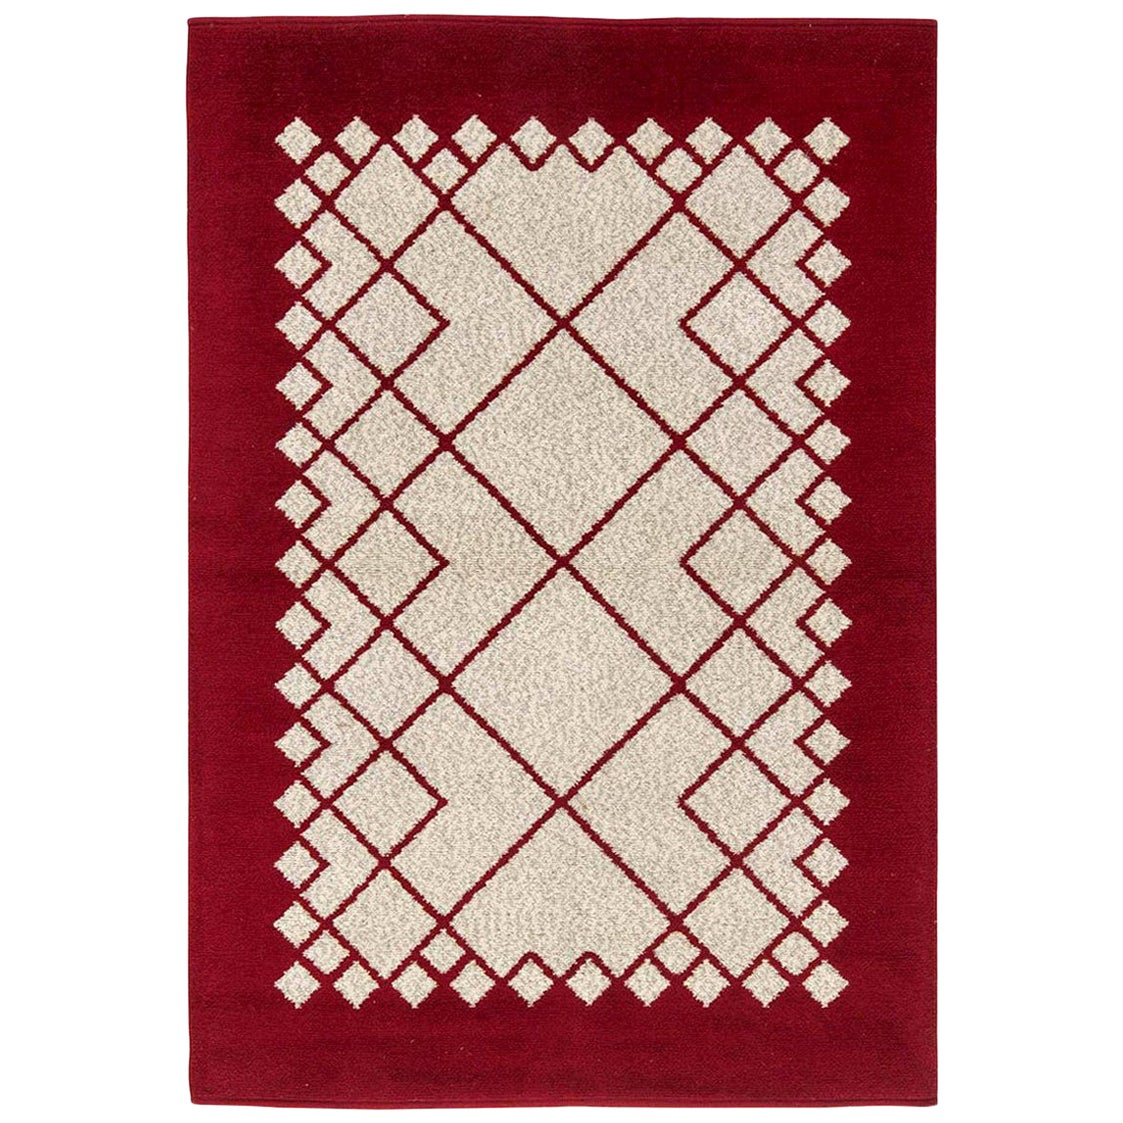 Midcentury Swedish Deep Burgundy and White Double Sided Flat-Weave Wool Rug